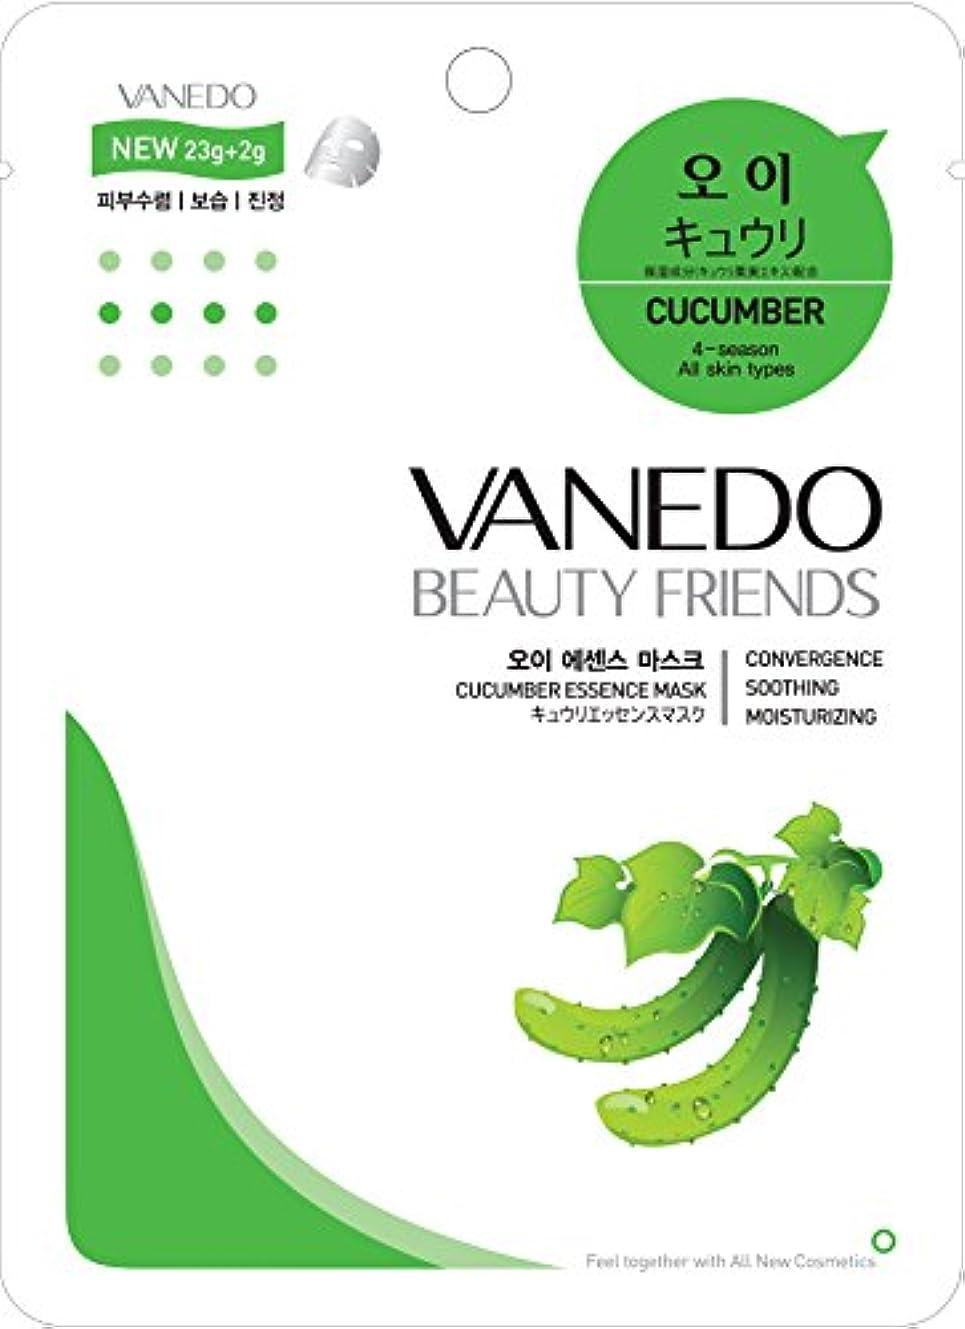 【VANEDO】バネド シートマスク キュウリ 10枚セット/エッセンス/保湿/フェイスマスク/フェイスパック/マスクパック/韓国コスメ [メール便]